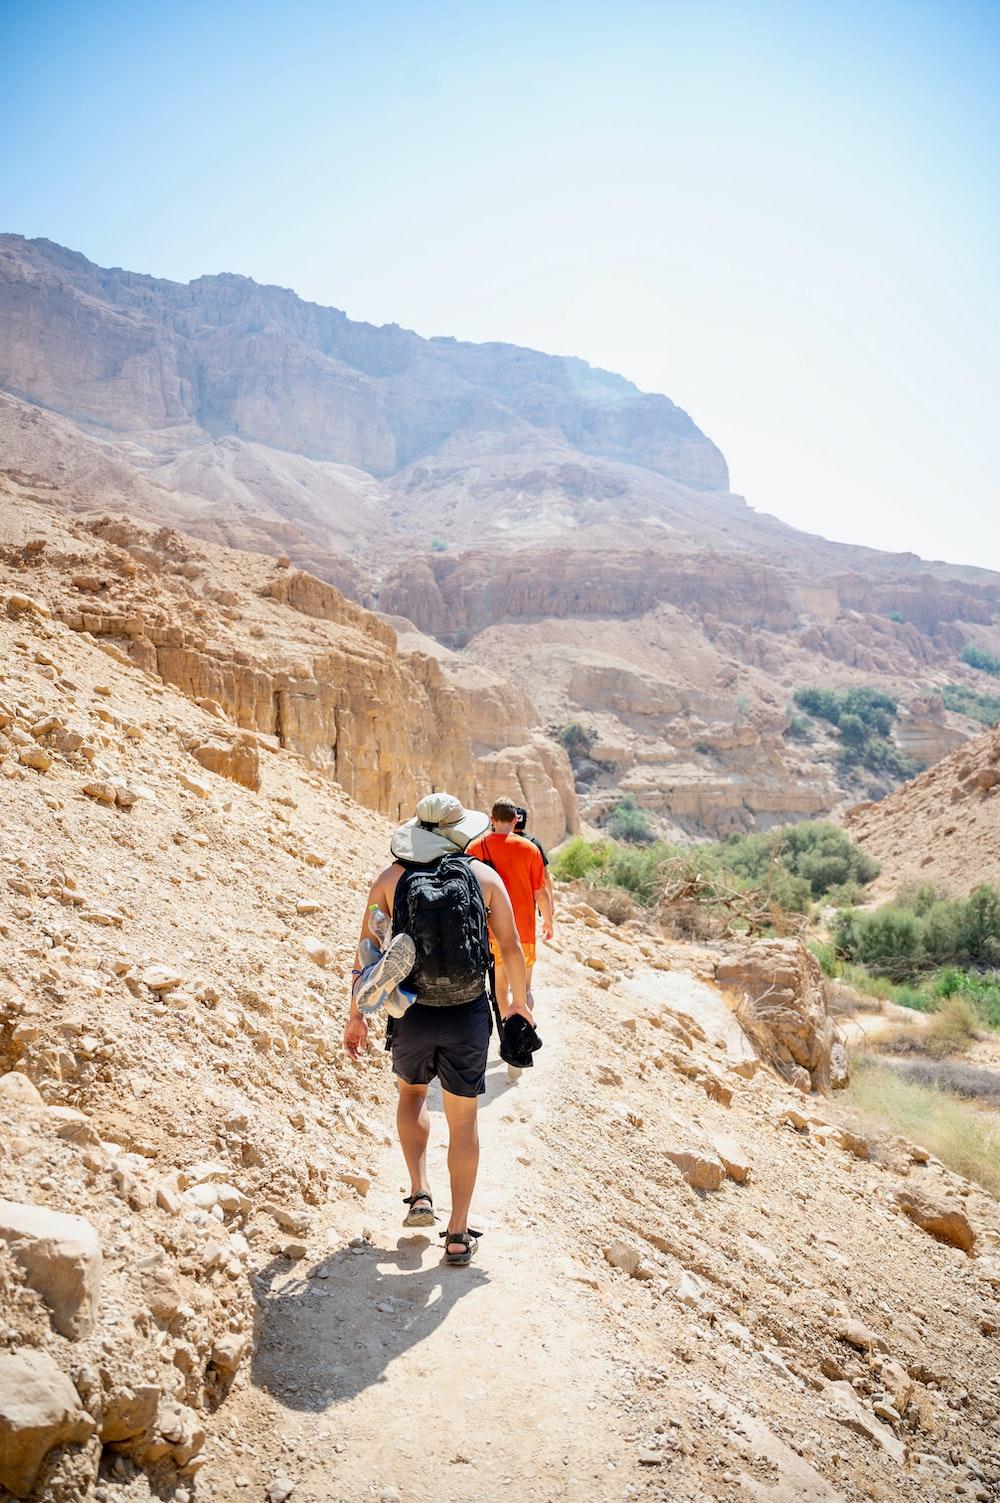 man in white shirt and black shorts walking on brown rocky mountain during daytime